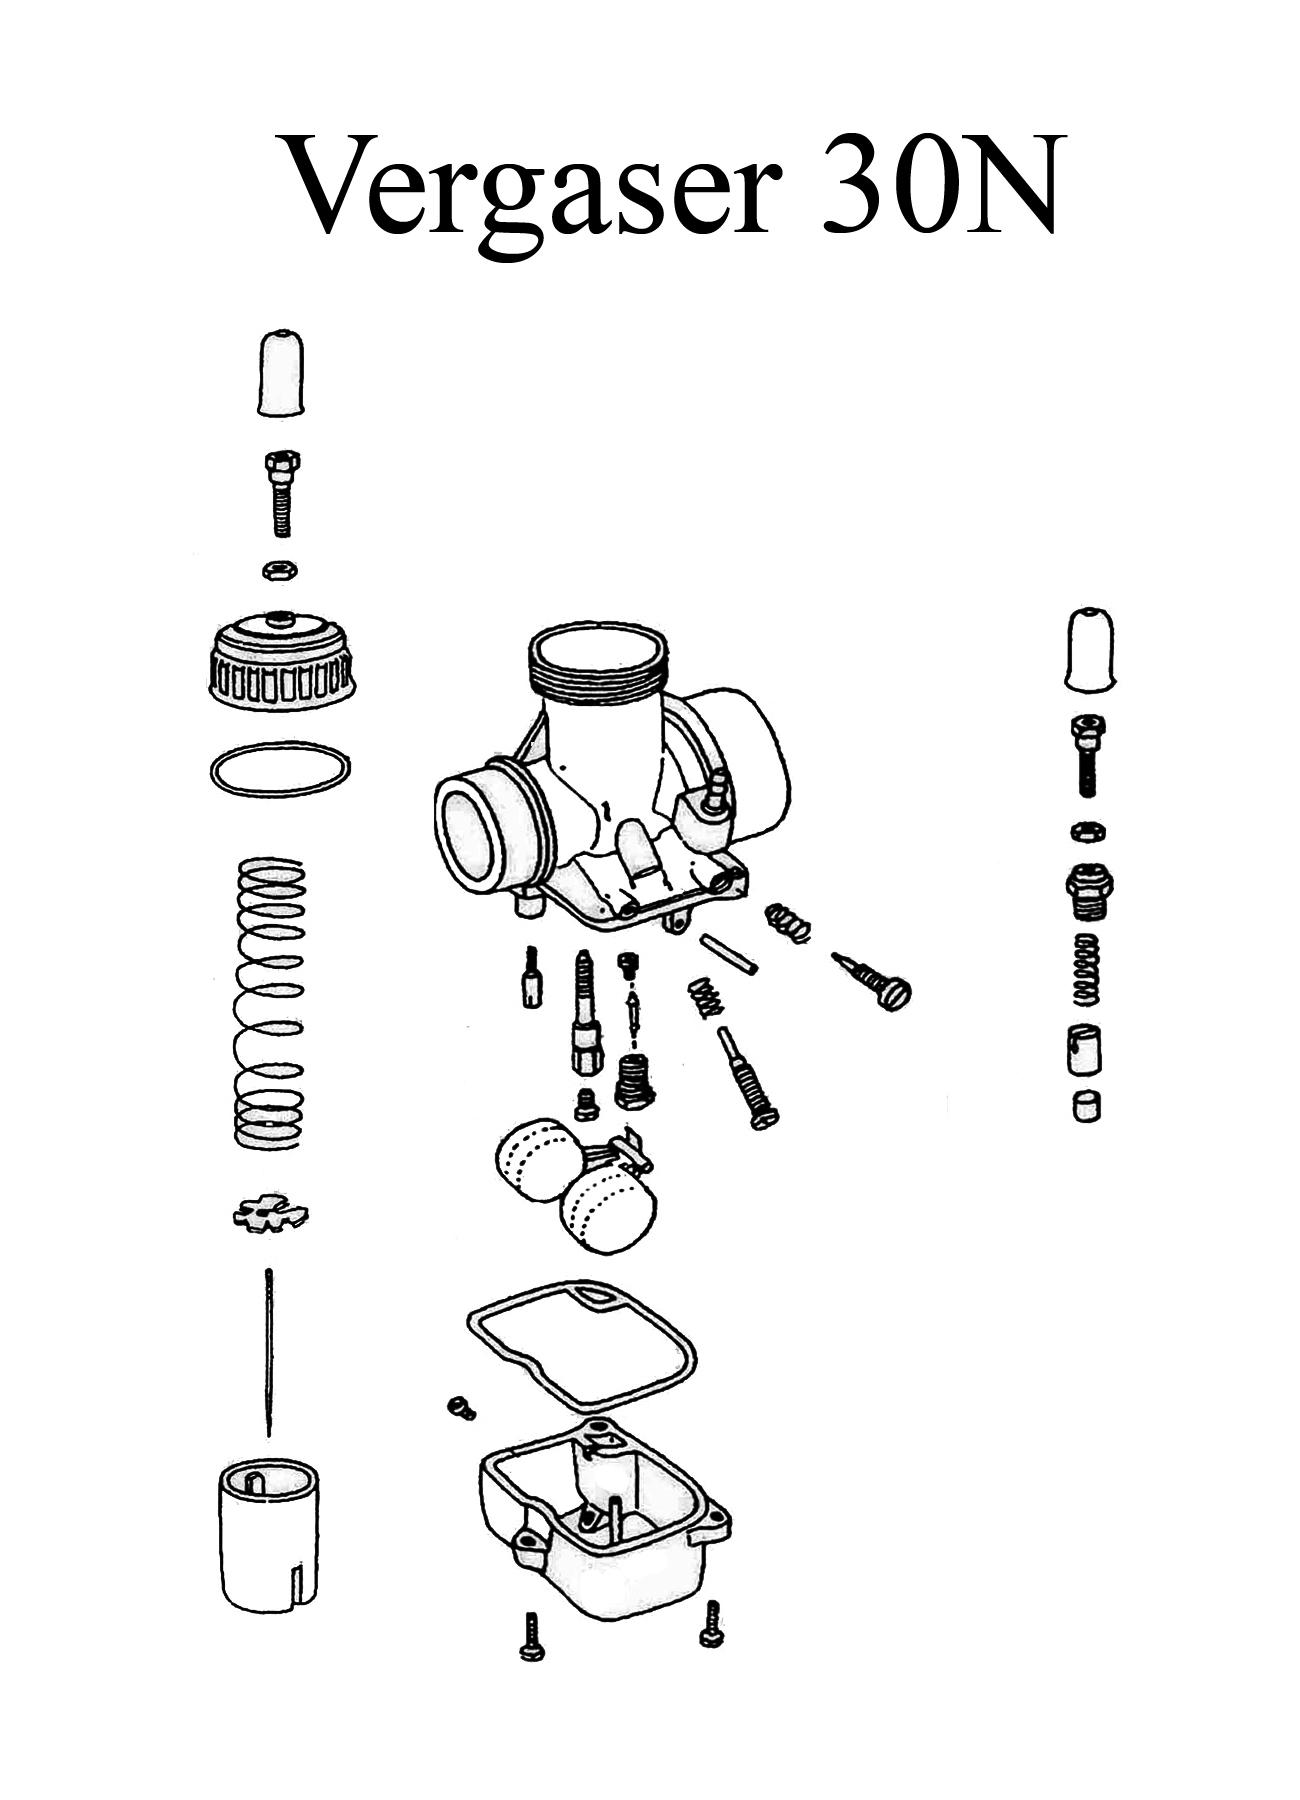 MZ TS 250/0-1 Ersatzteile Vergaser